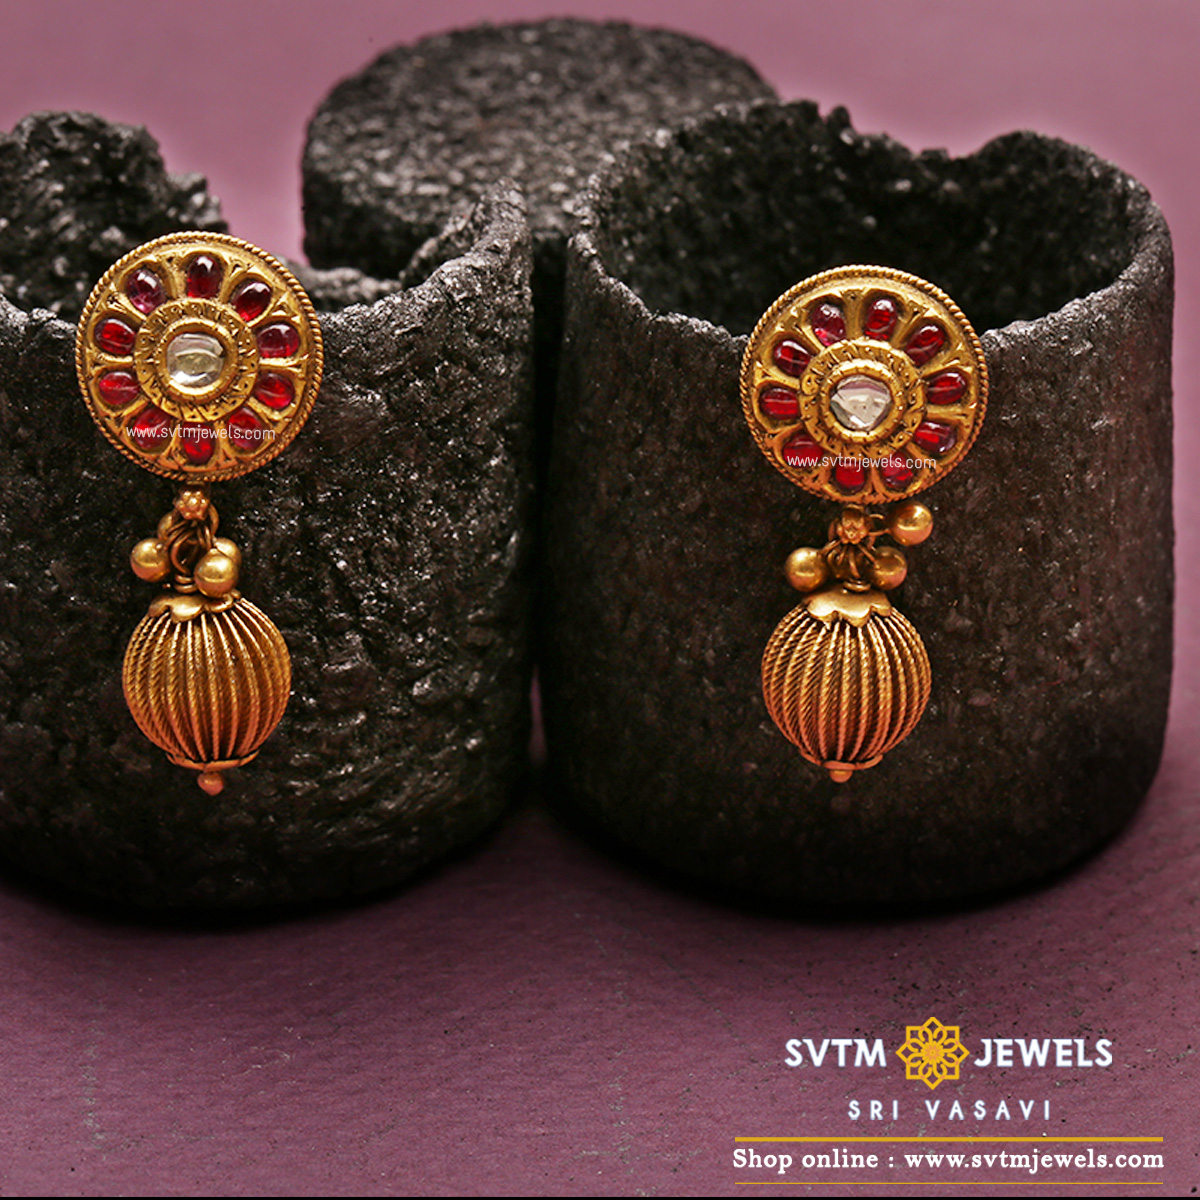 Capriana Earrings